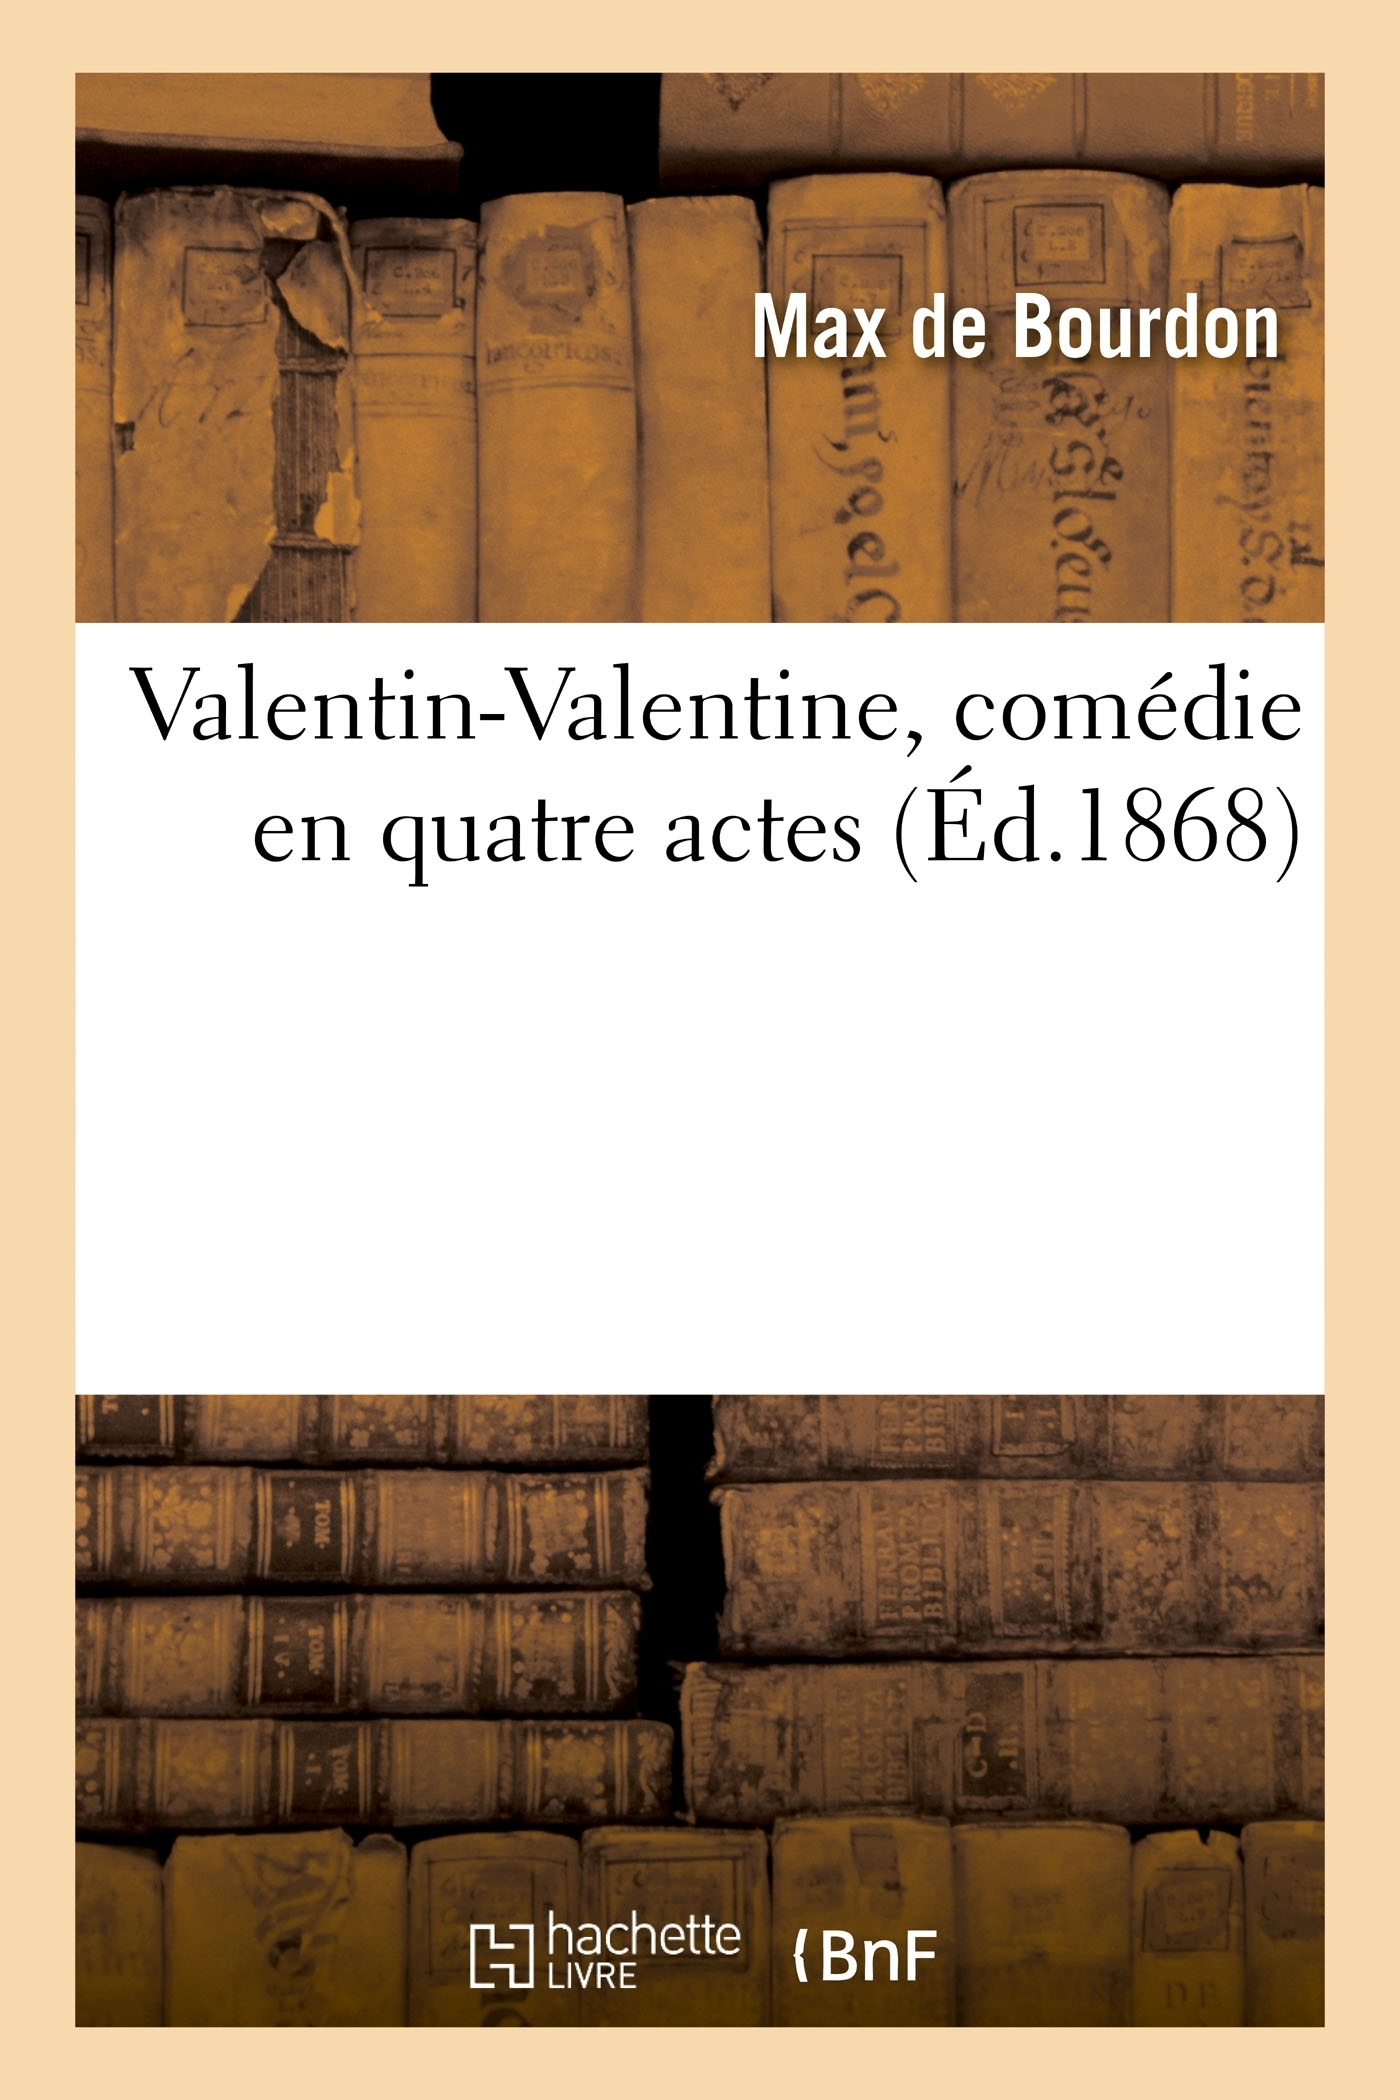 VALENTIN-VALENTINE, COMEDIE EN QUATRE ACTES